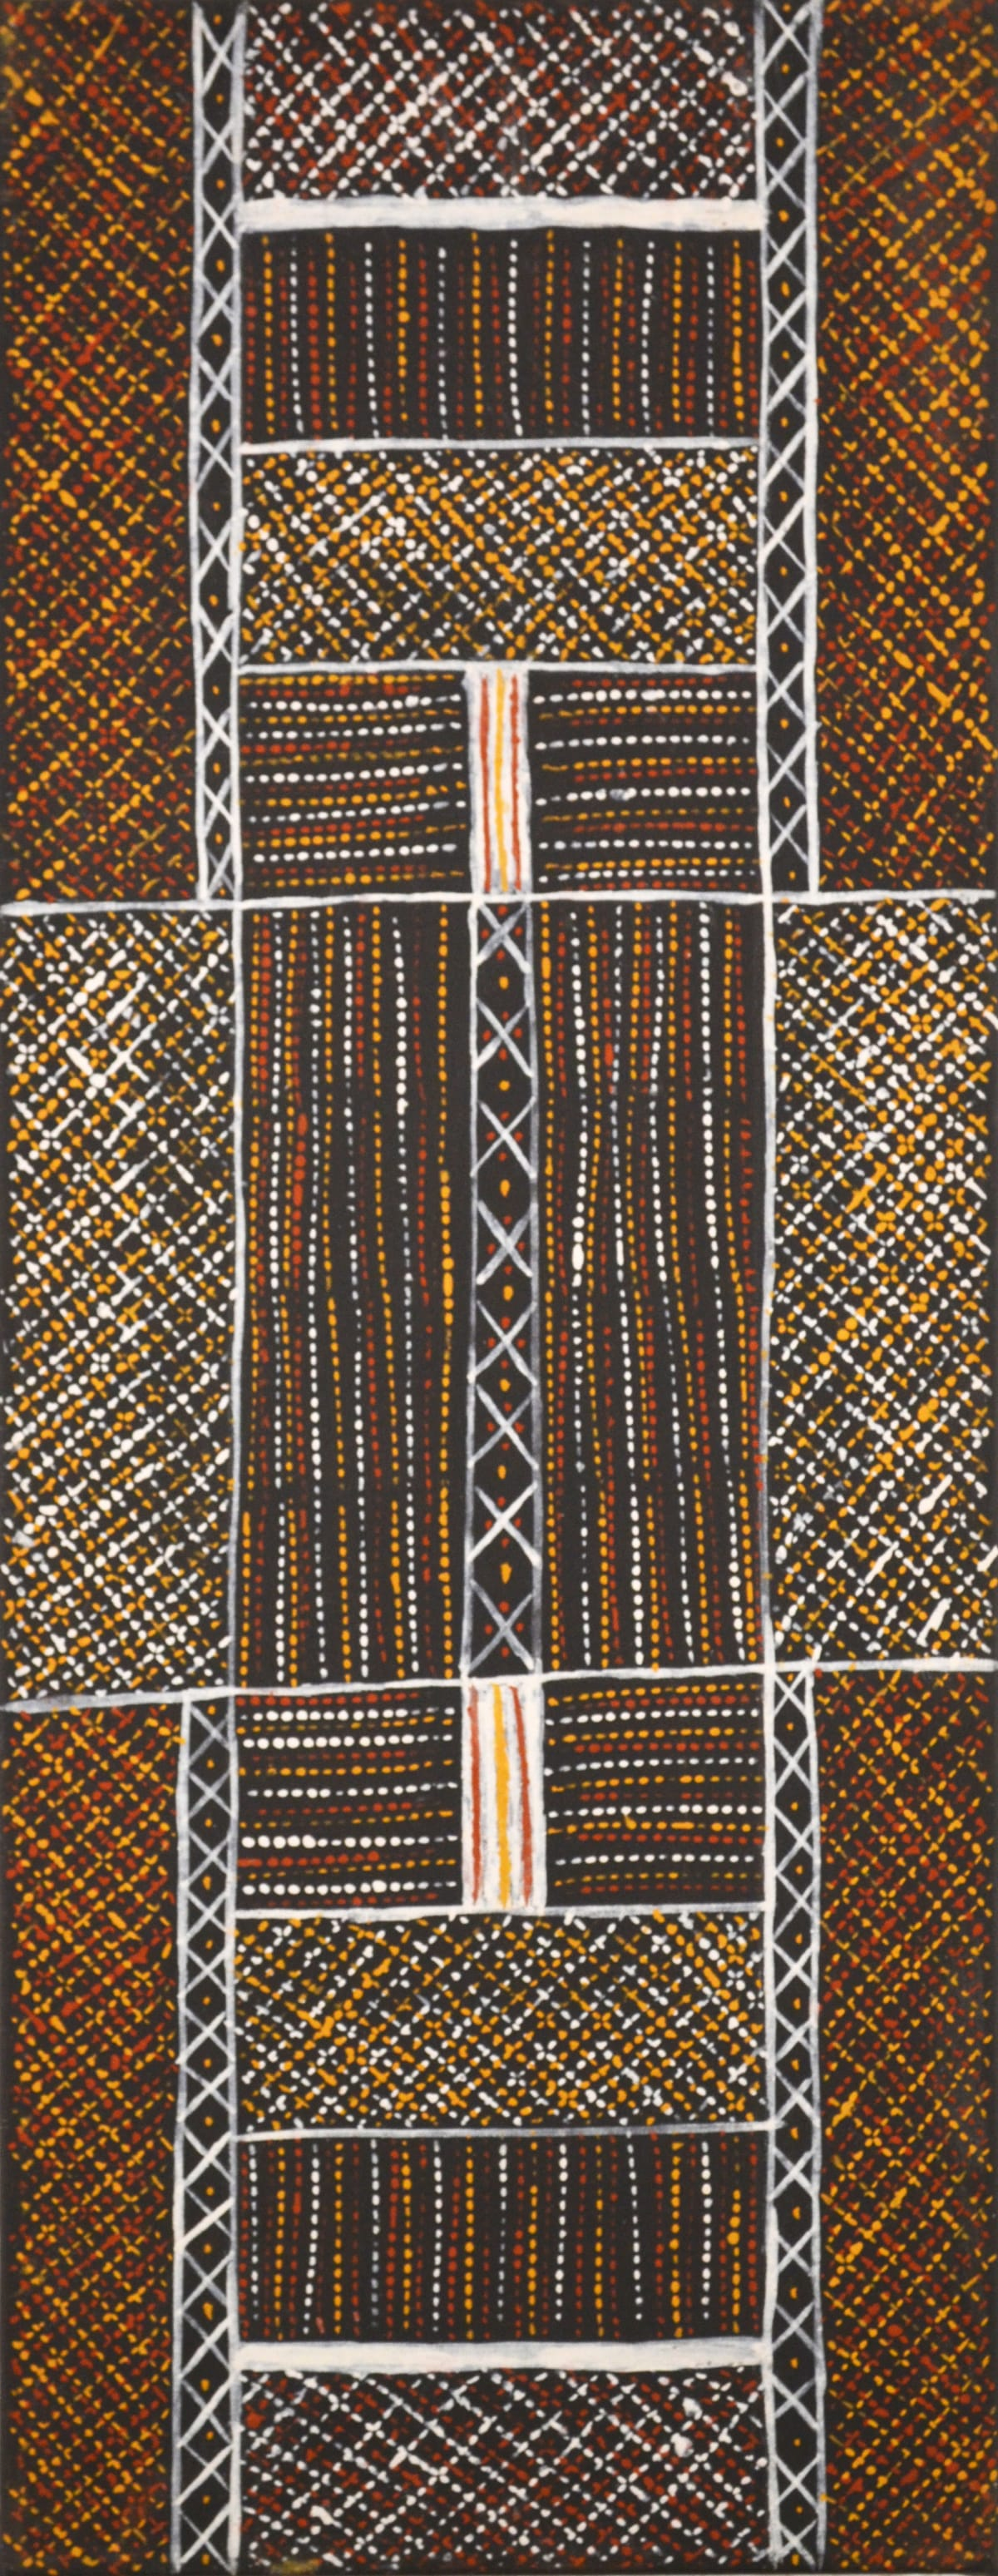 Brian Farmer Illortamini Jilamara ochre on canvas 80 x 30 cm